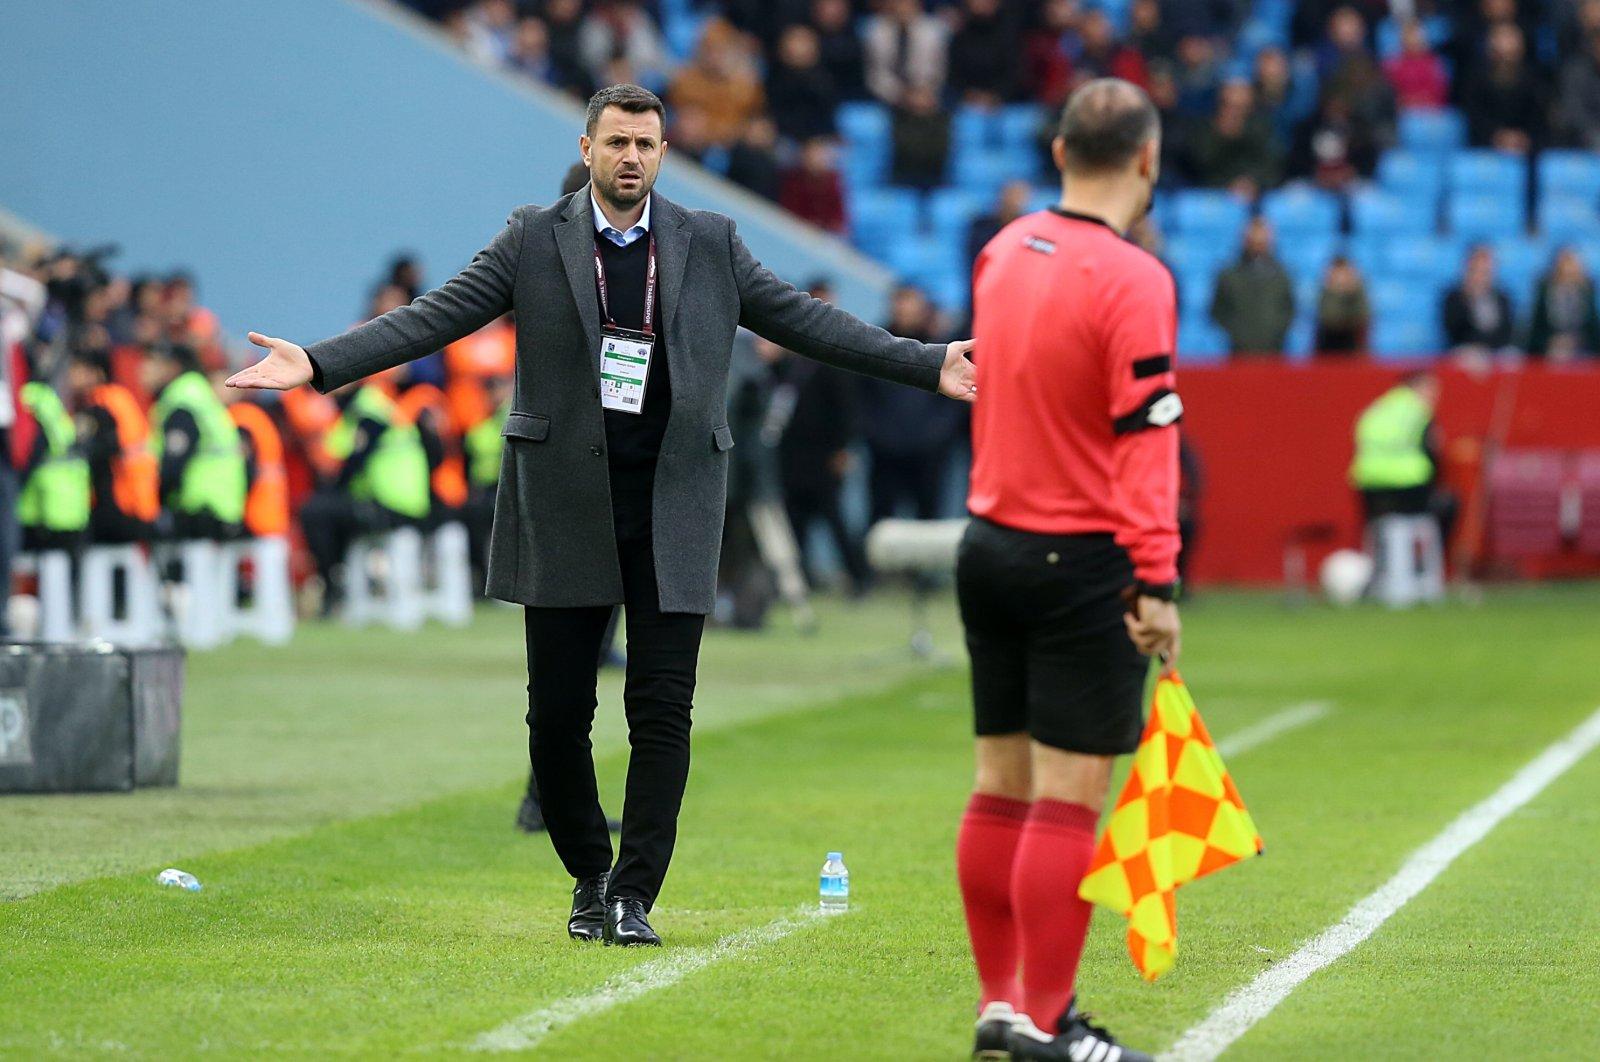 Trabzonspor coach Hüseyin Çimşir reacts during a Süper Lig match in Trabzon, northern Turkey, Jan. 19, 2020. (AA Photo)